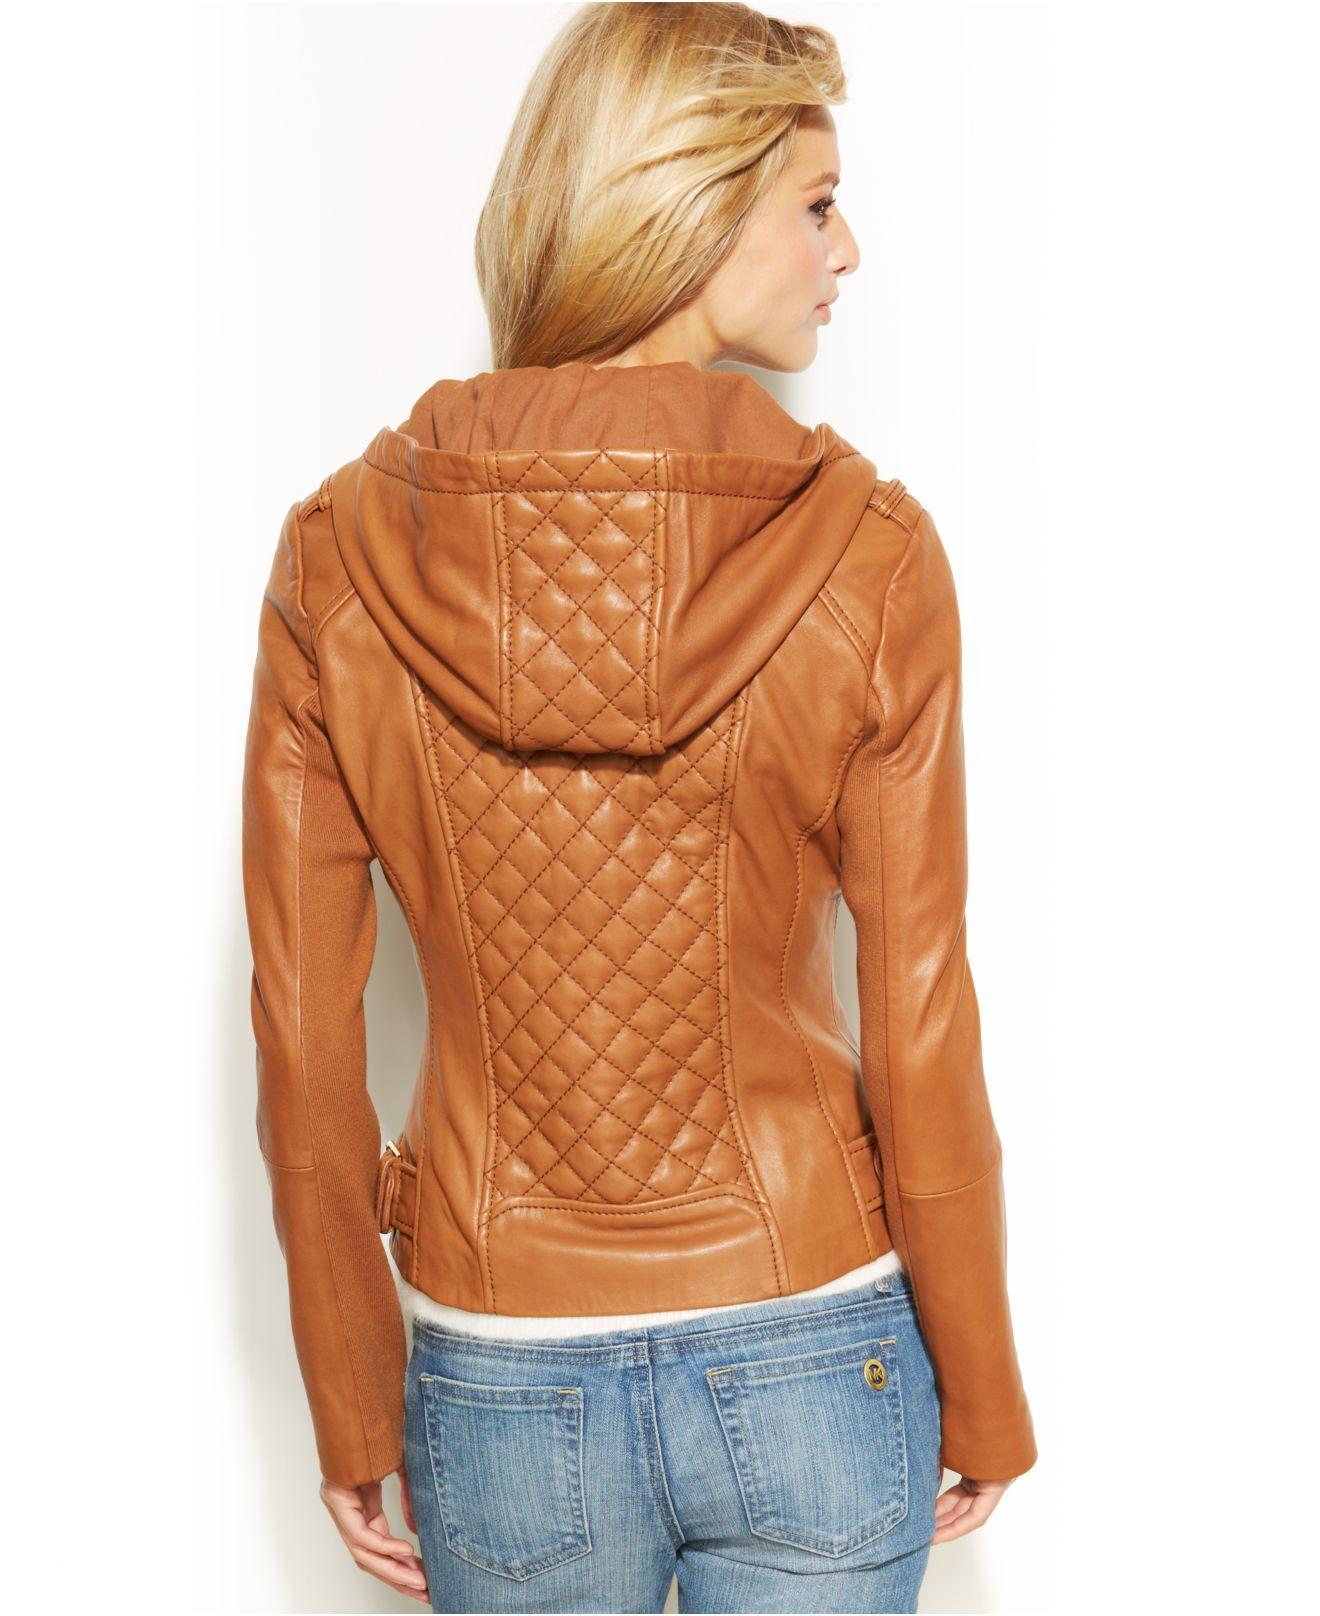 de8fdb3f667 Michael Kors Michael Petite Knit-Inset Hooded Leather Jacket in ...